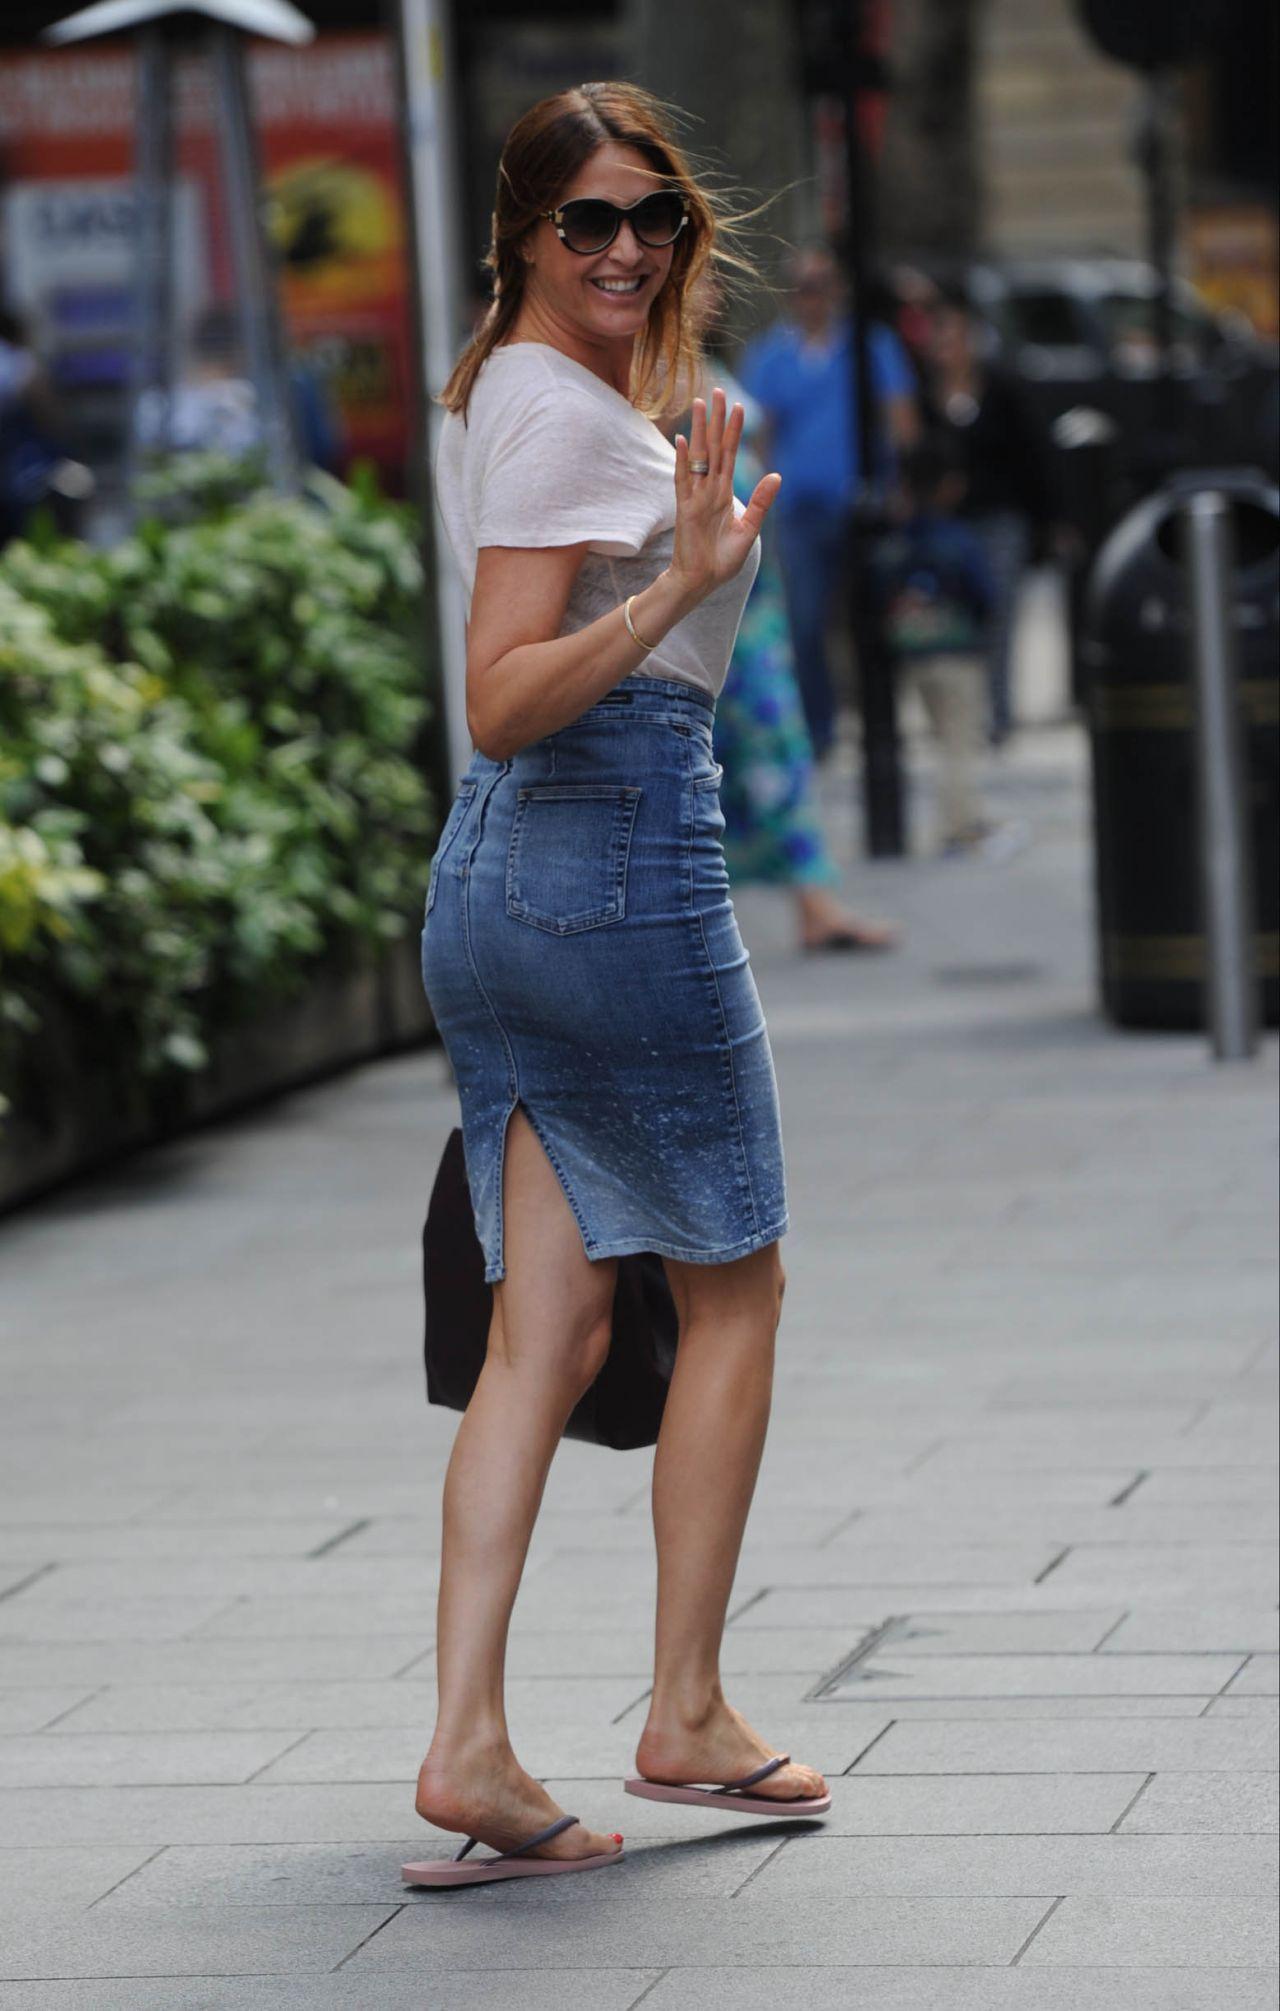 Leaked Lisa Snowdon nudes (38 foto and video), Pussy, Sideboobs, Feet, braless 2020